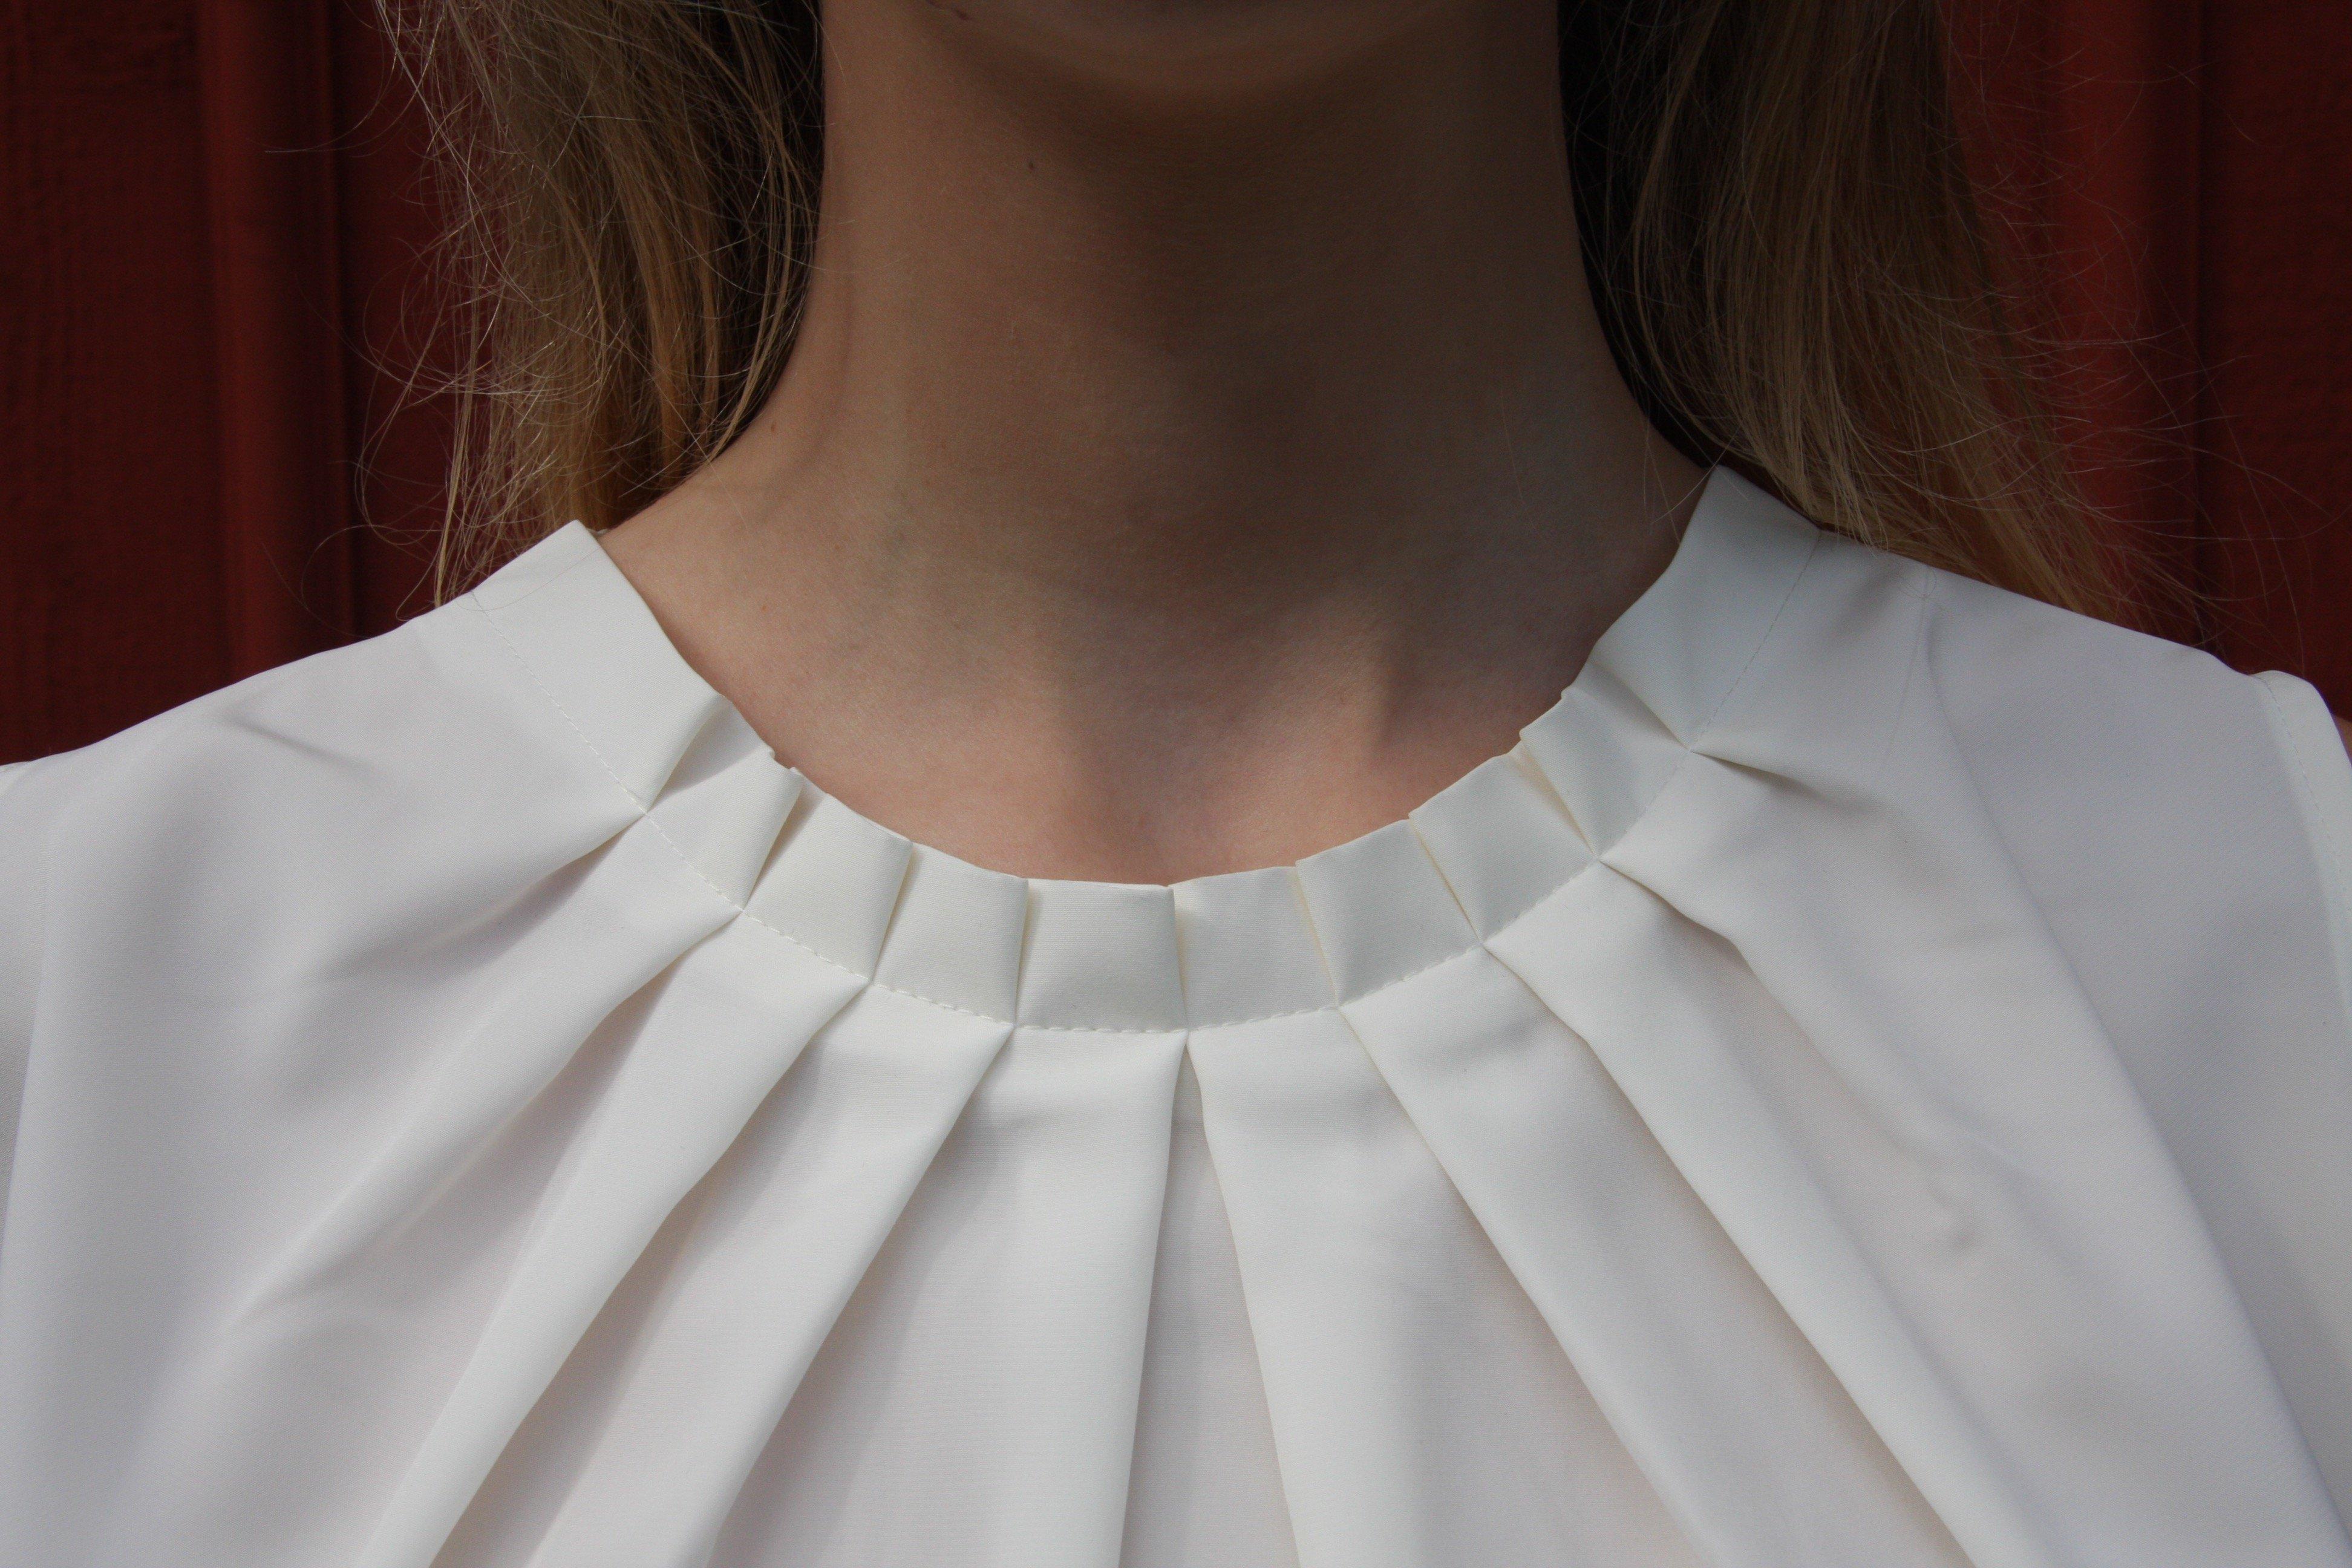 Blus/topp Pauline creamvit med vacker plisserad krage. Bild på krage.